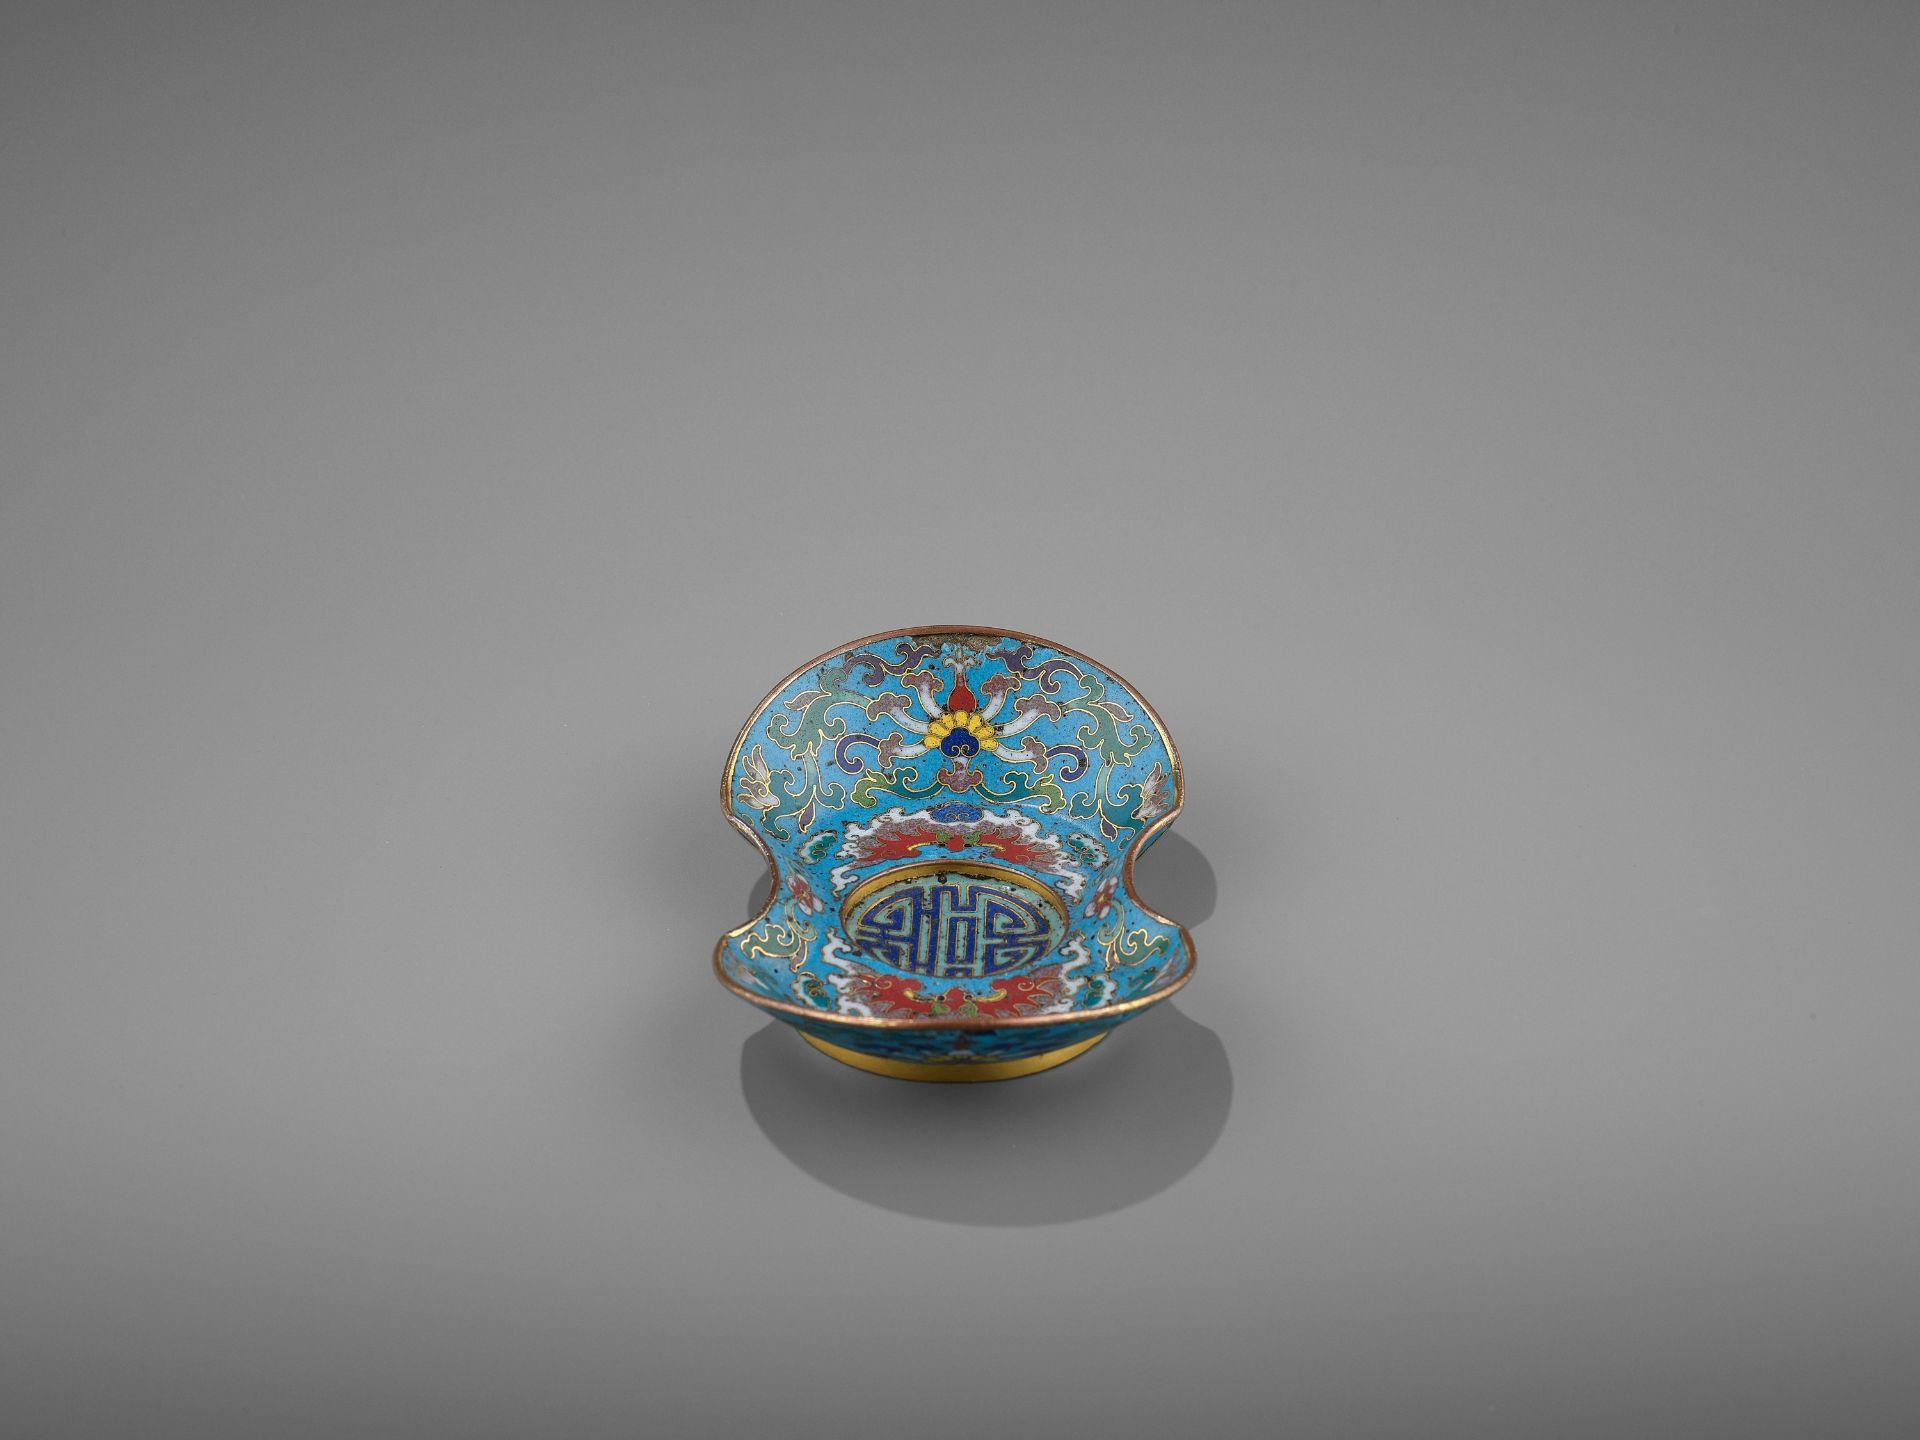 A CLOISONNE AND GILT-BRONZE 'DOUBLE HAPPINESS' CUP STAND, QIANLONG - Bild 3 aus 10